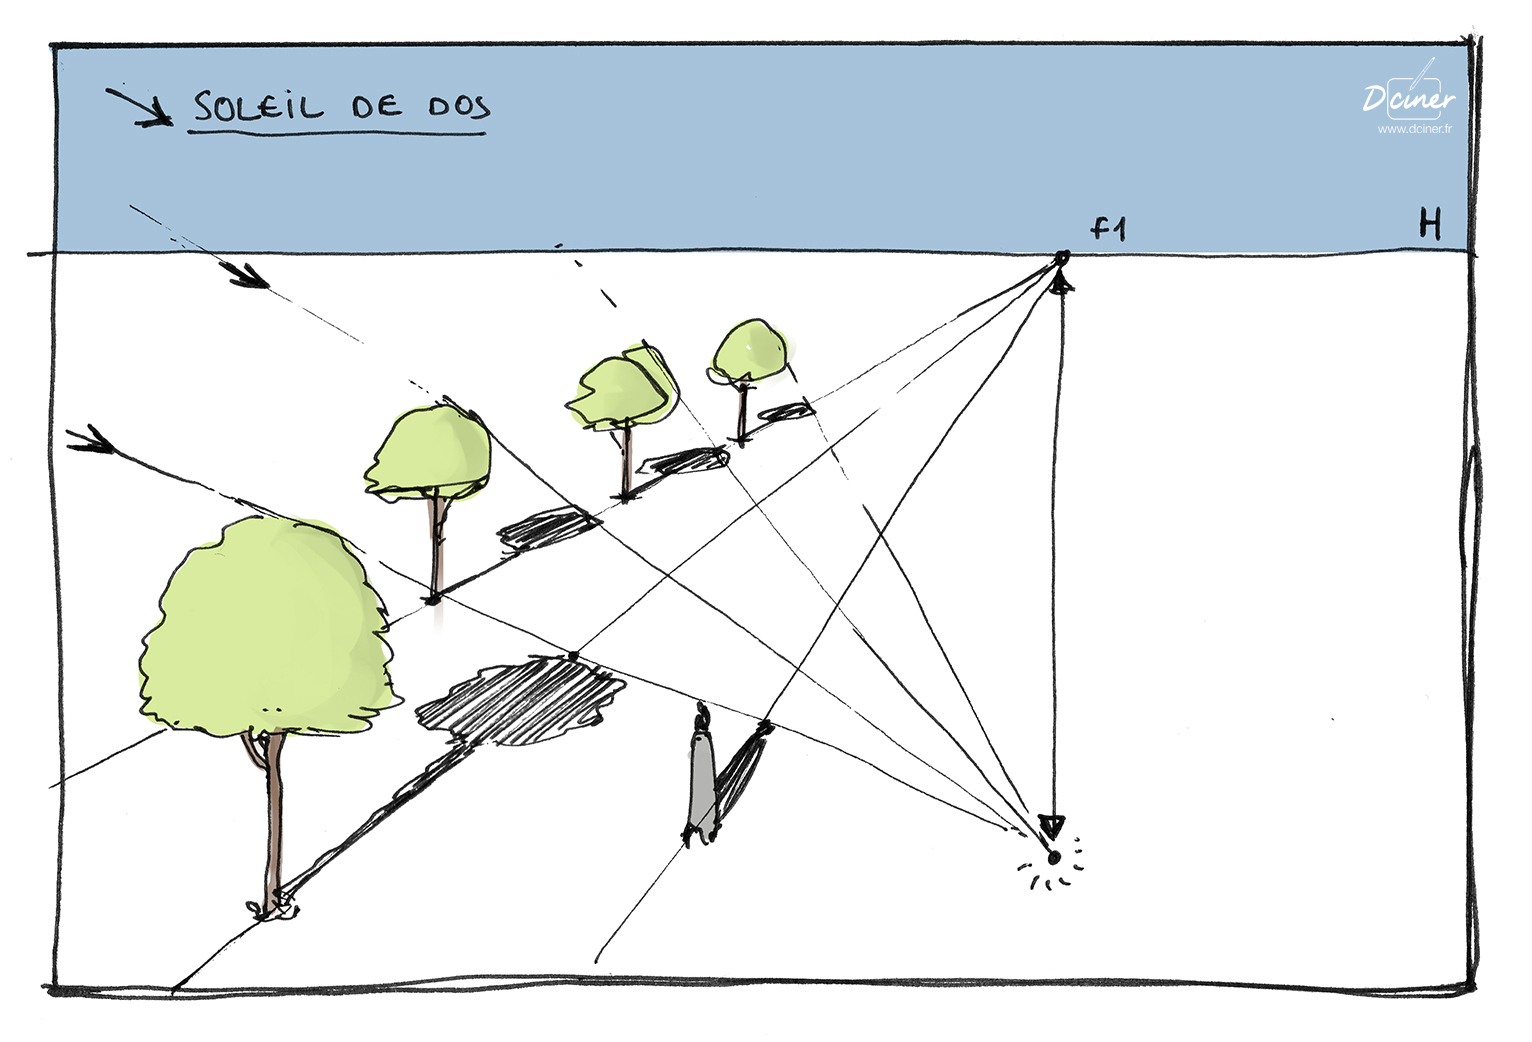 Comment Dessiner Les Ombres En Perspective | Apprendre À avec Apprendre A Dessiner Les Ombres